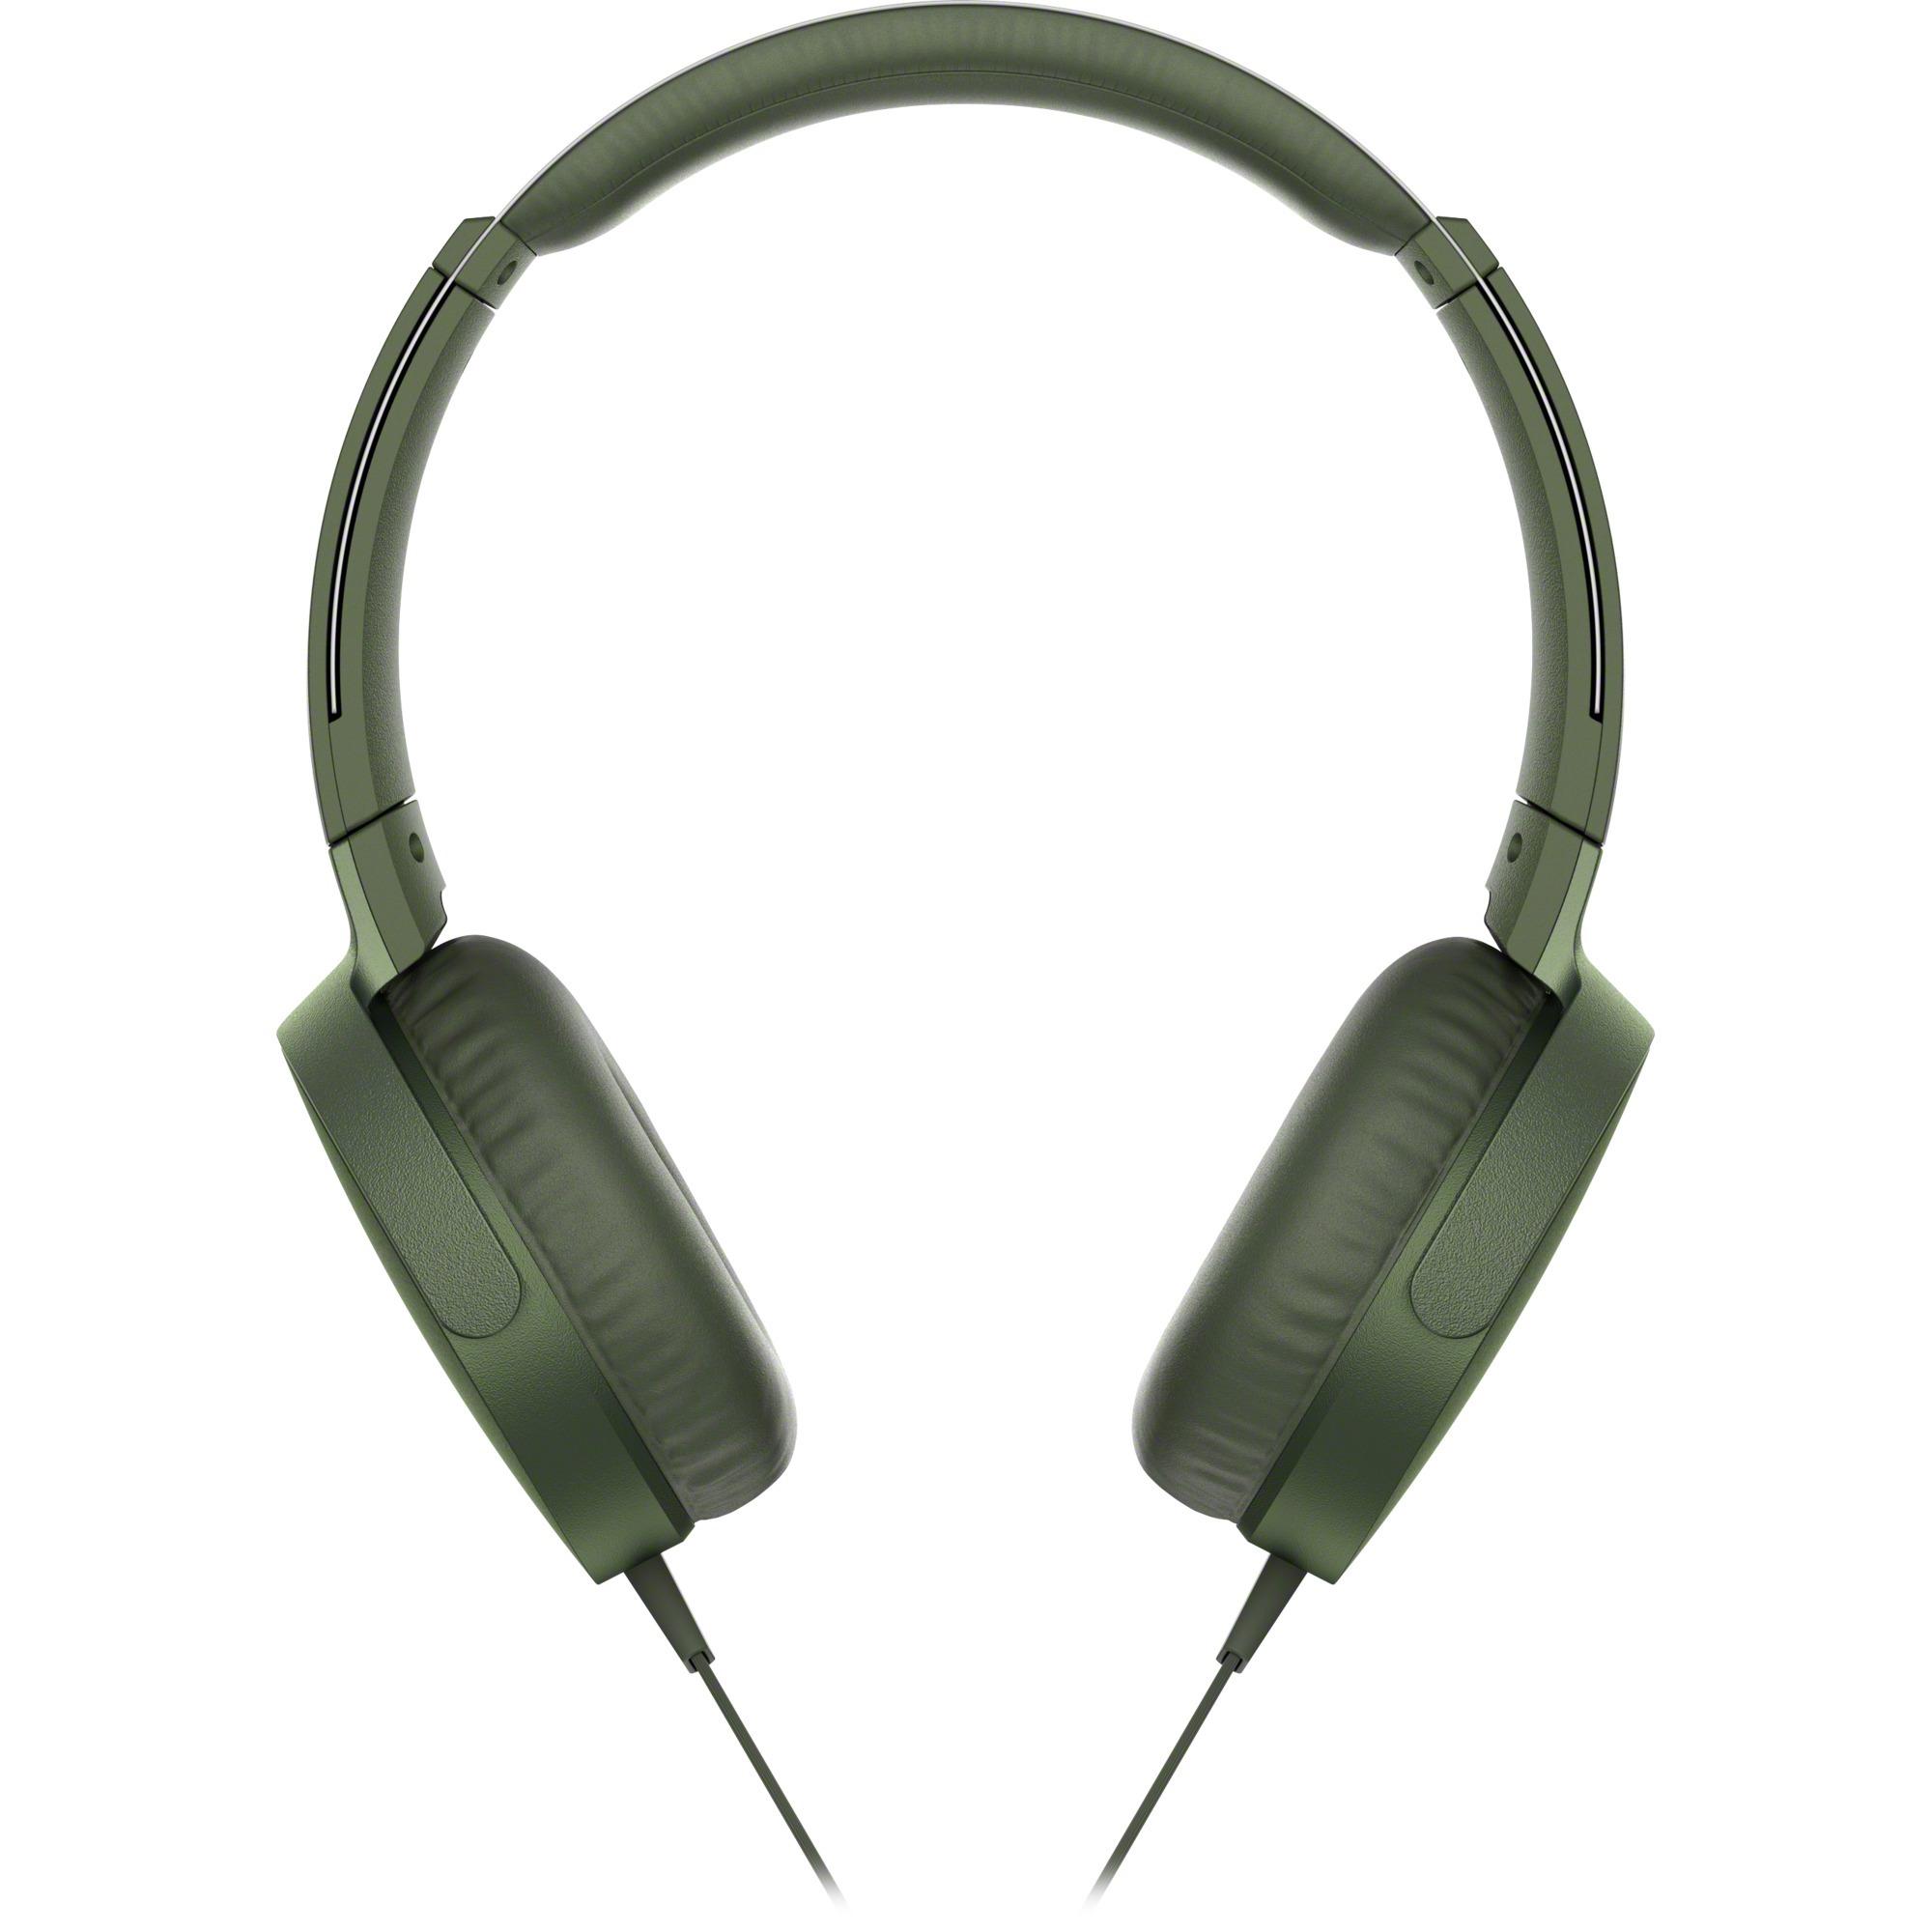 7b43c711066 Sony XB550AP auriculares para móvil Binaural Diadema Verde, Auriculares con  micrófono verde, Alámbrico, Diadema, Binaural, Circumaural, 5 - 22000 Hz,  Verde